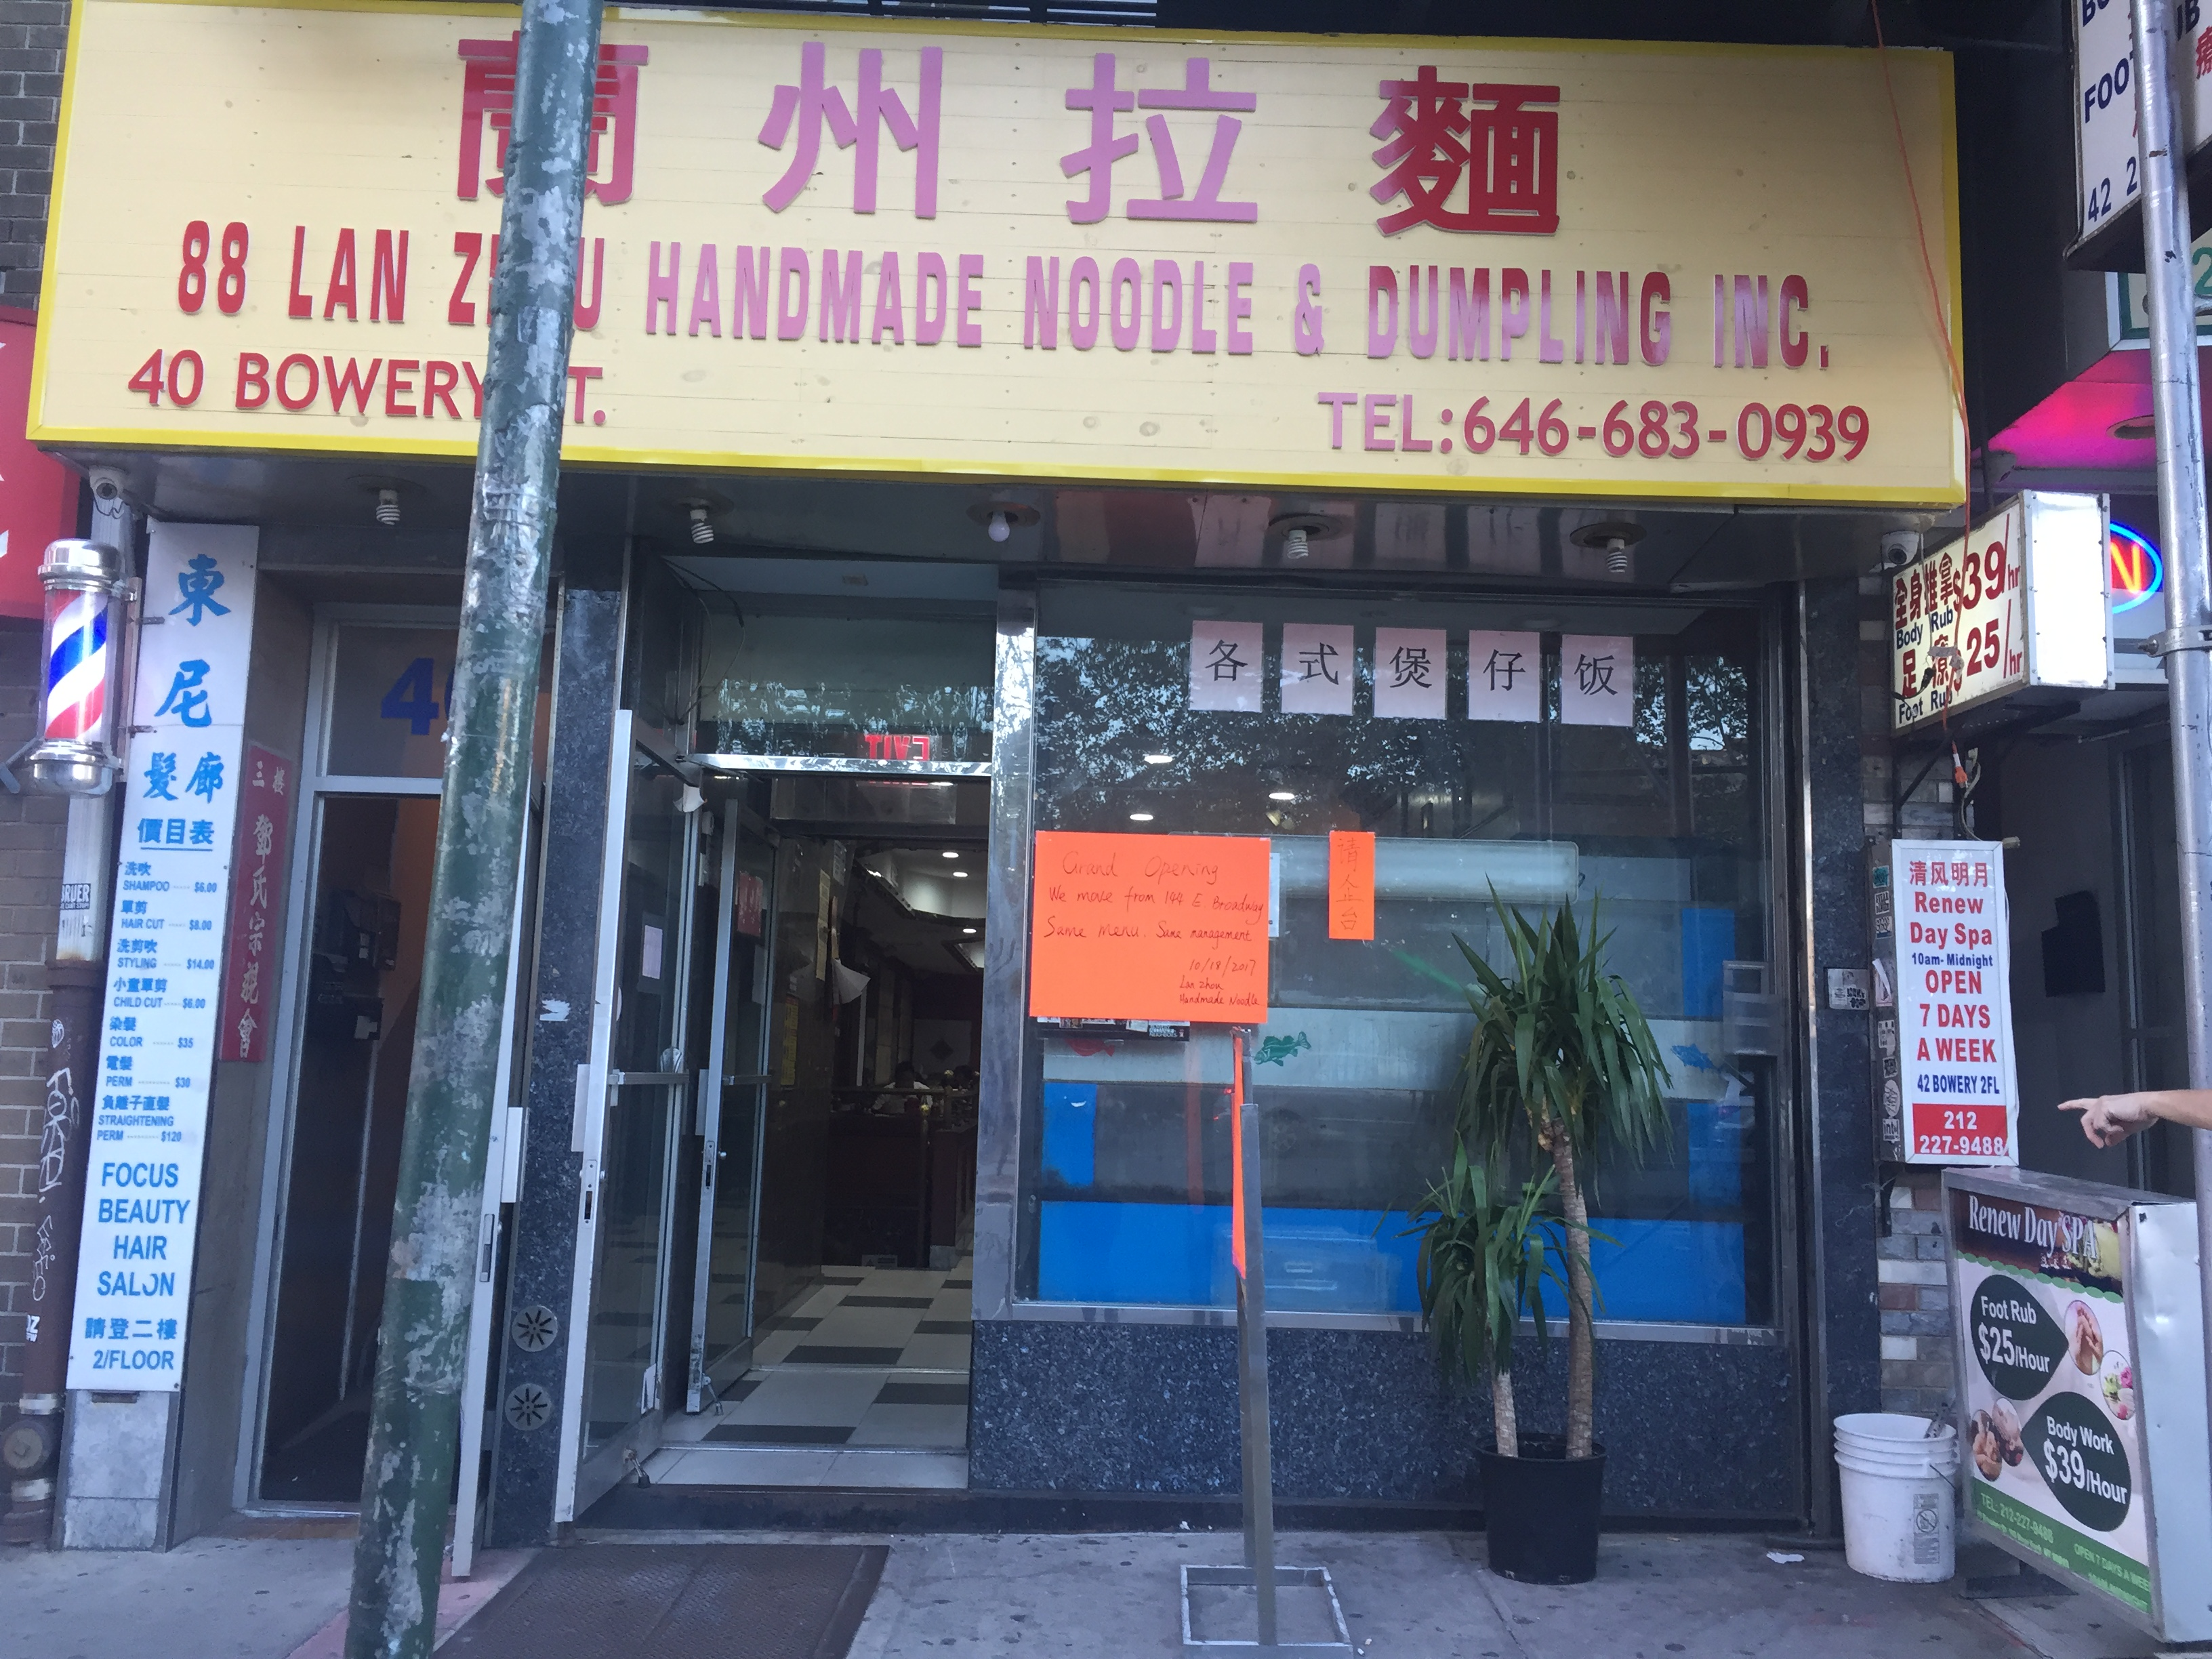 Lan Zhou Handmade Noodle